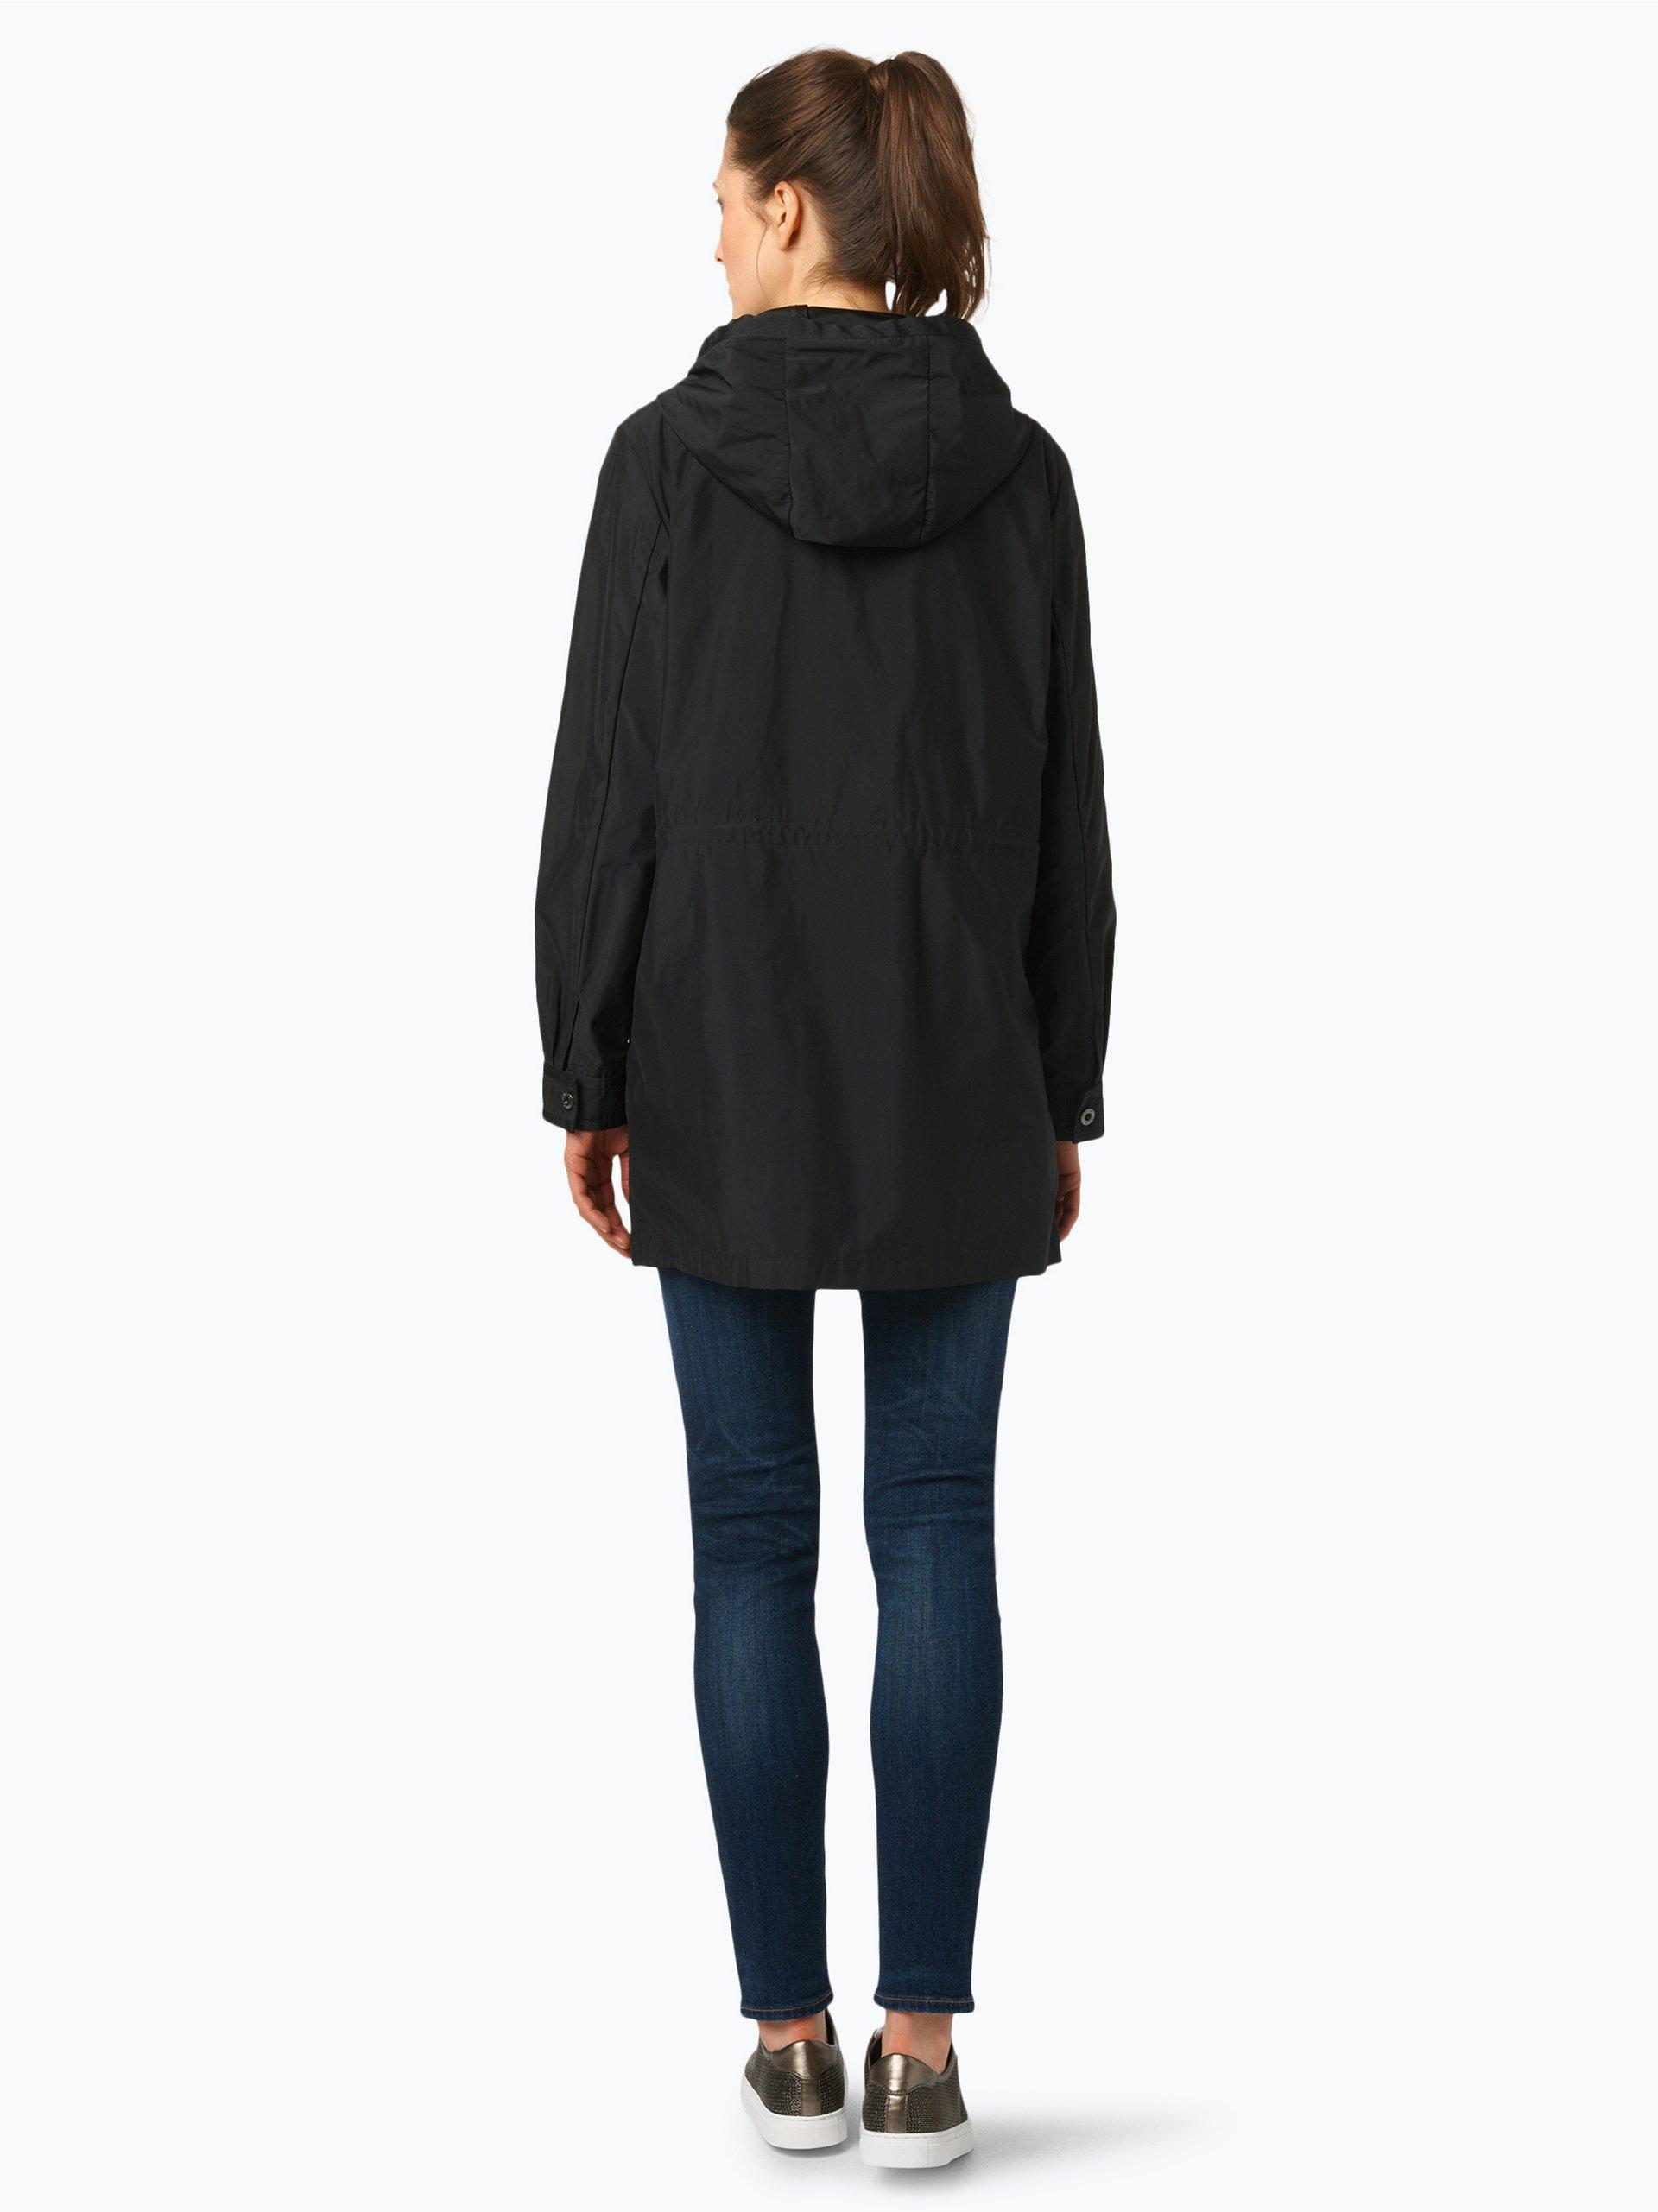 armani jeans damen mantel schwarz uni online kaufen peek. Black Bedroom Furniture Sets. Home Design Ideas